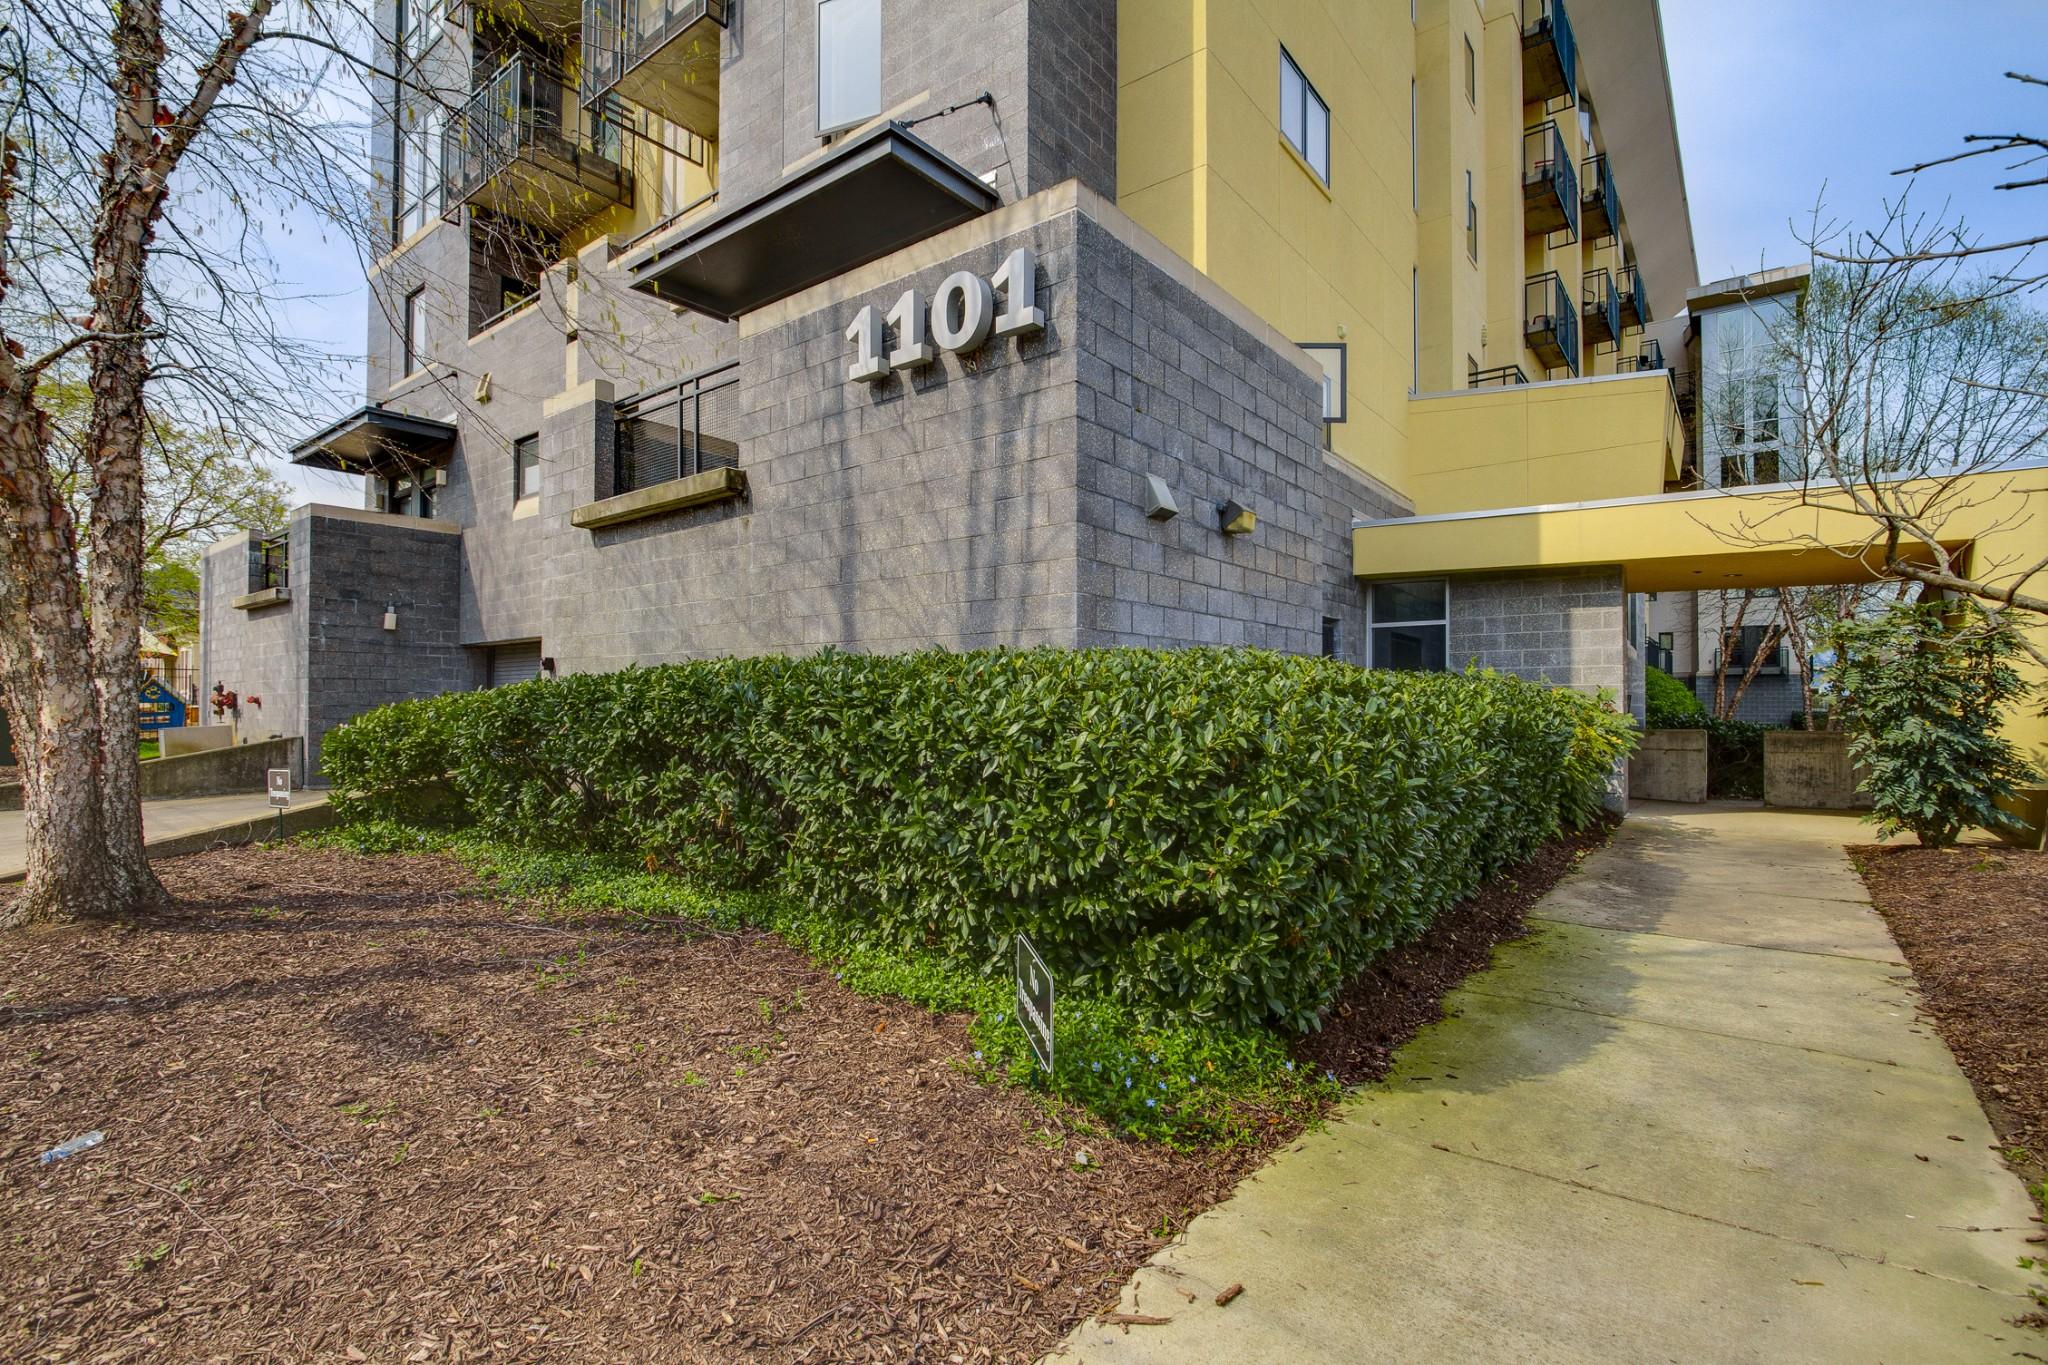 1101 18th Ave, S, Nashville, TN 37212 - Nashville, TN real estate listing